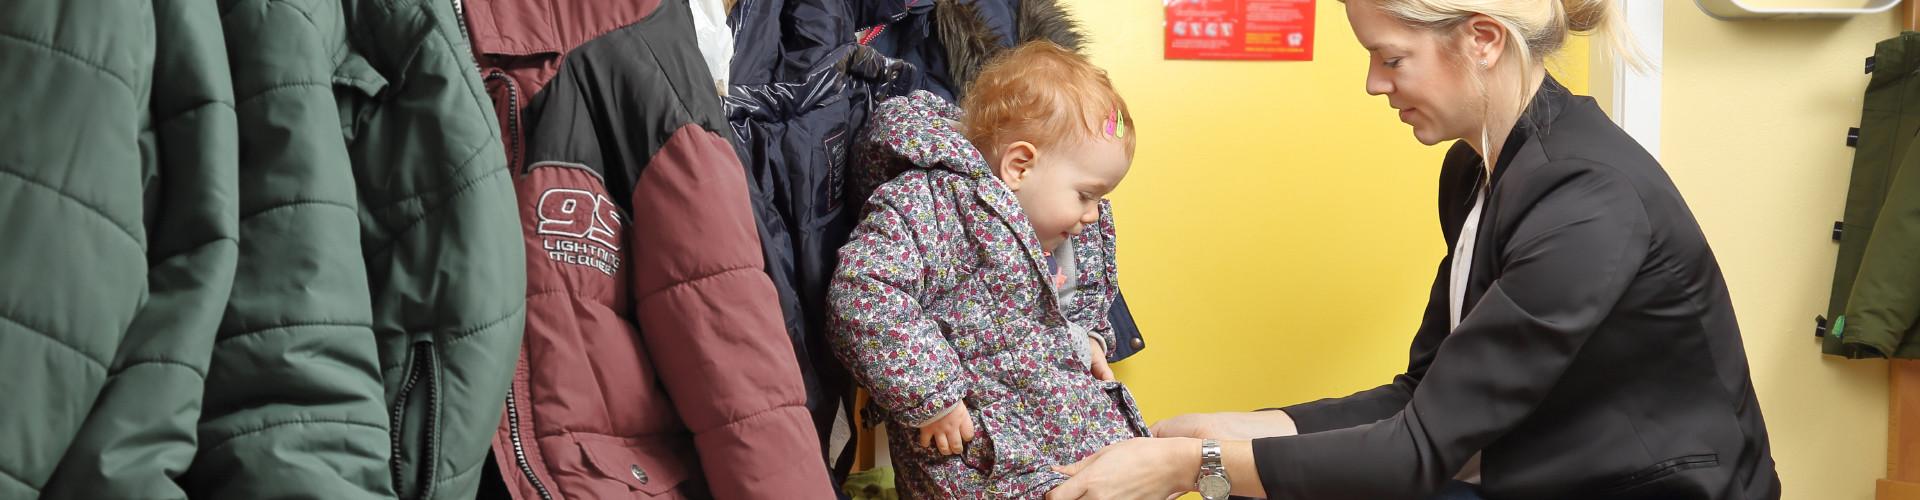 Frau zieht Kleinkind Jacke an © RioPatuca Images, stock.adobe.com